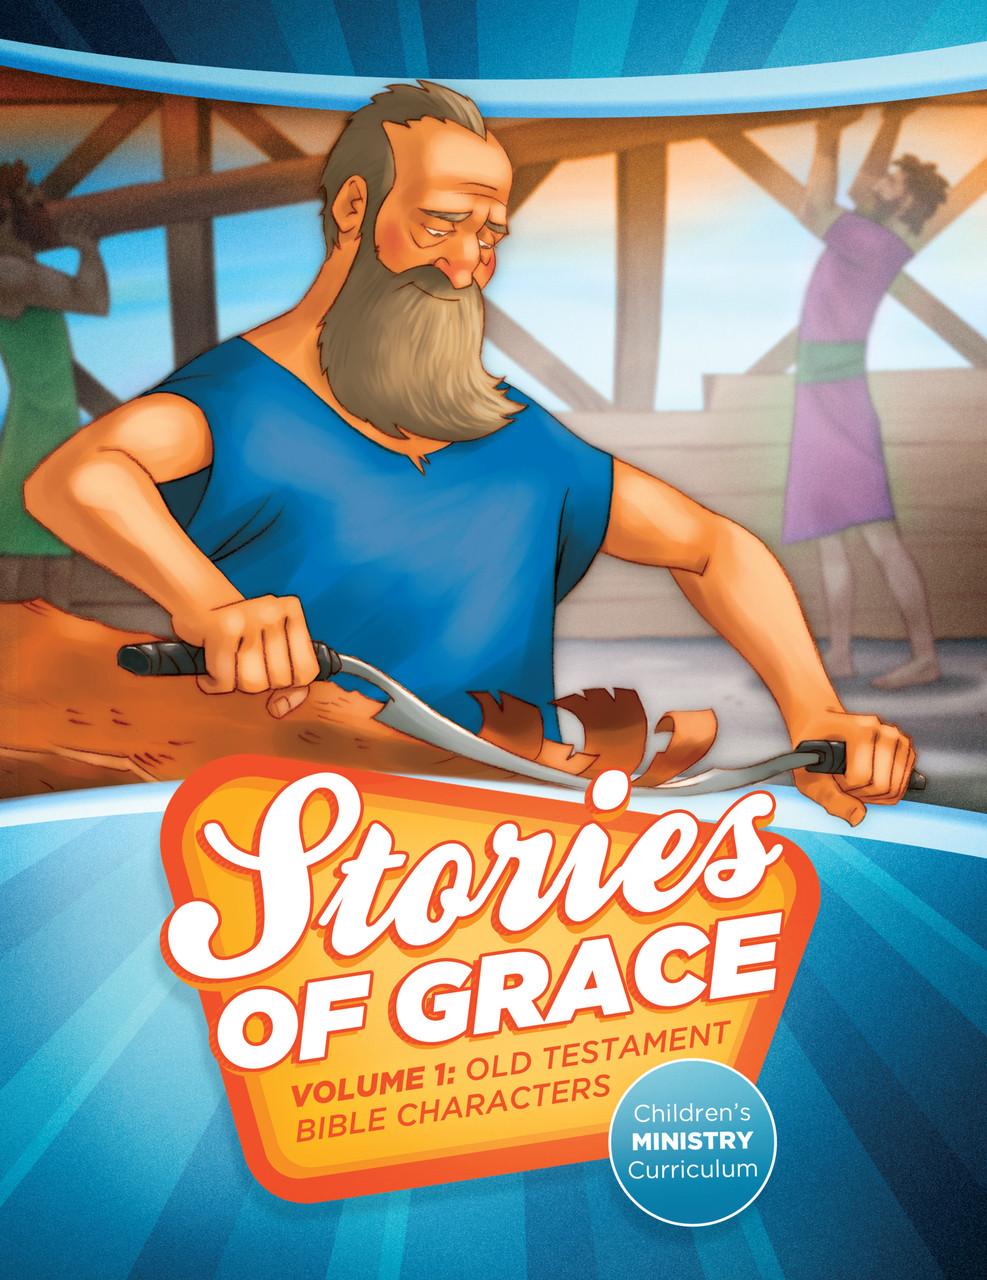 Bible Characters, Volume 1